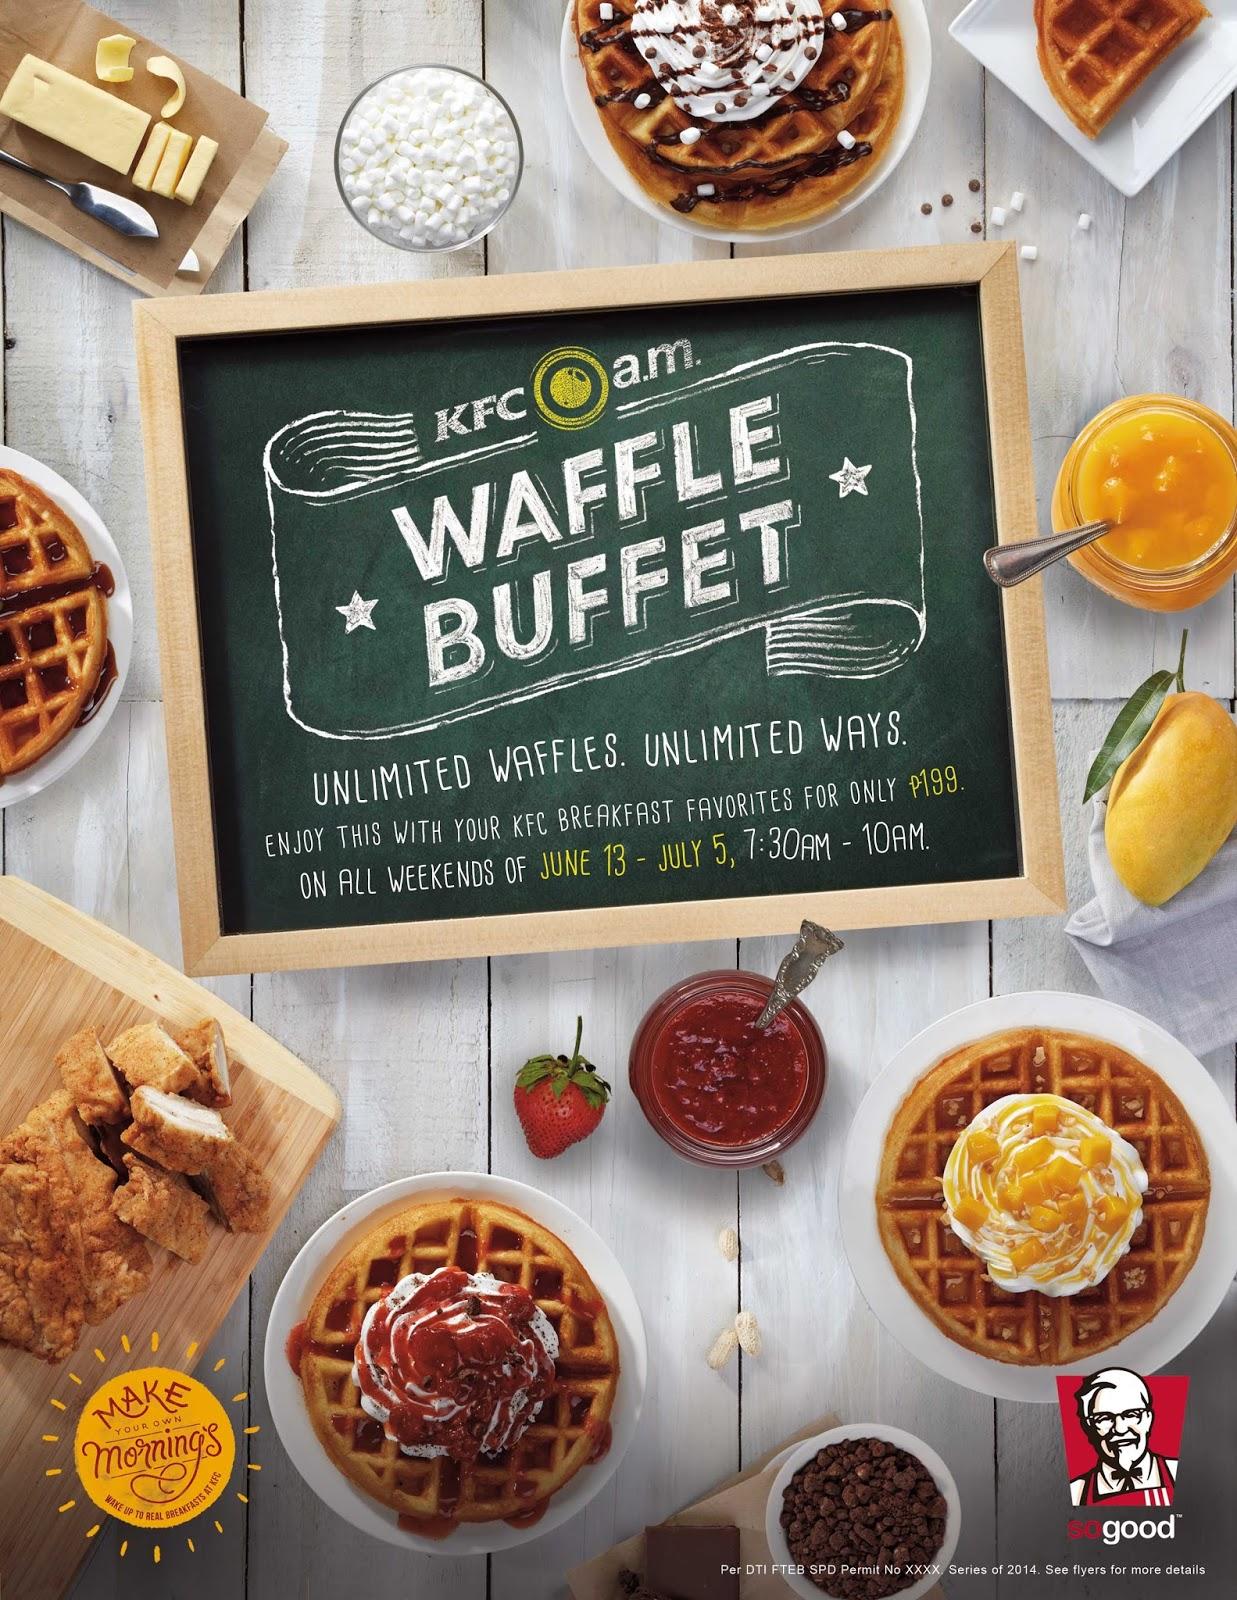 amazing jing for life kfc s new waffle buffet unlimited waffles rh amazingjingforlife blogspot com Breakfast Buffet Menu nearest brunch buffet